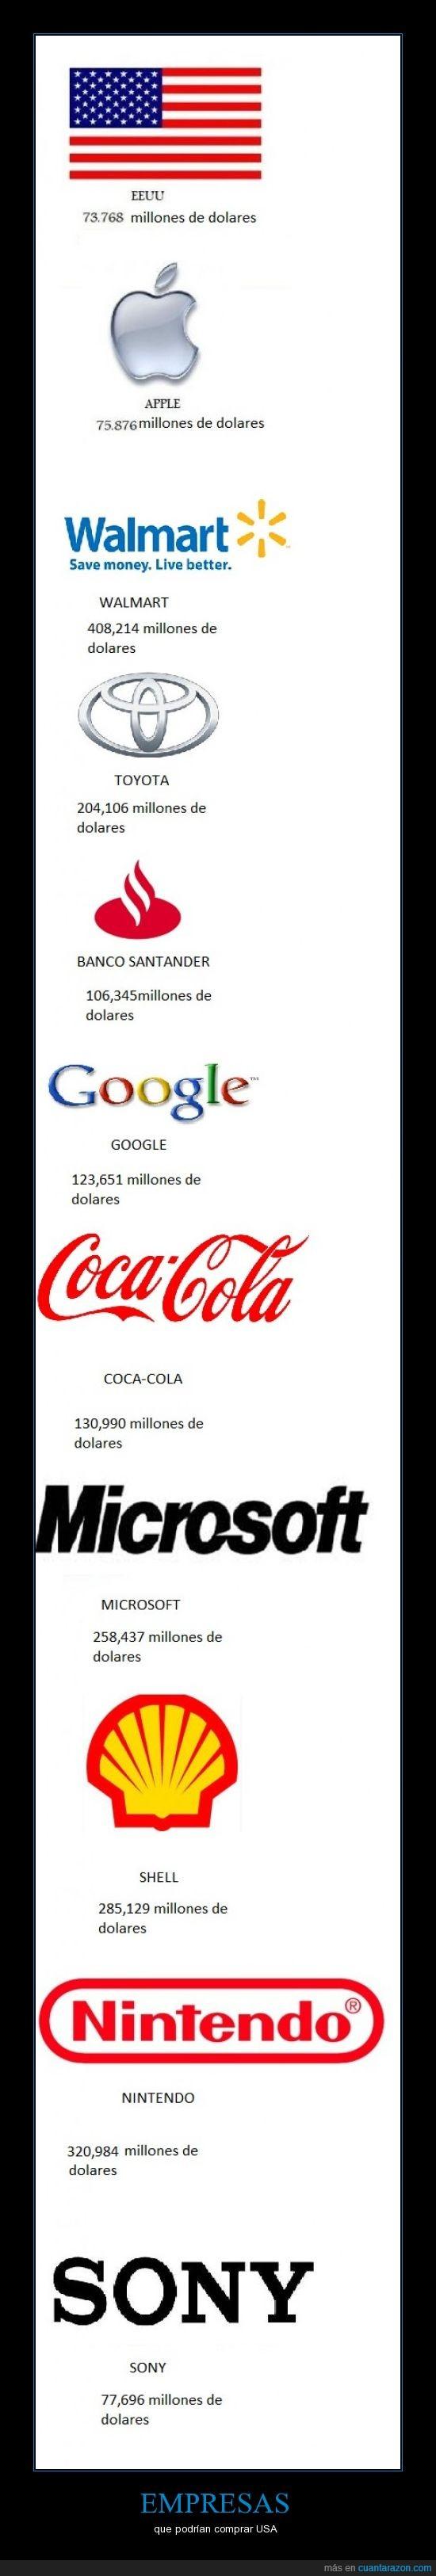 capital,capitalismo,comprar,empresas,usa